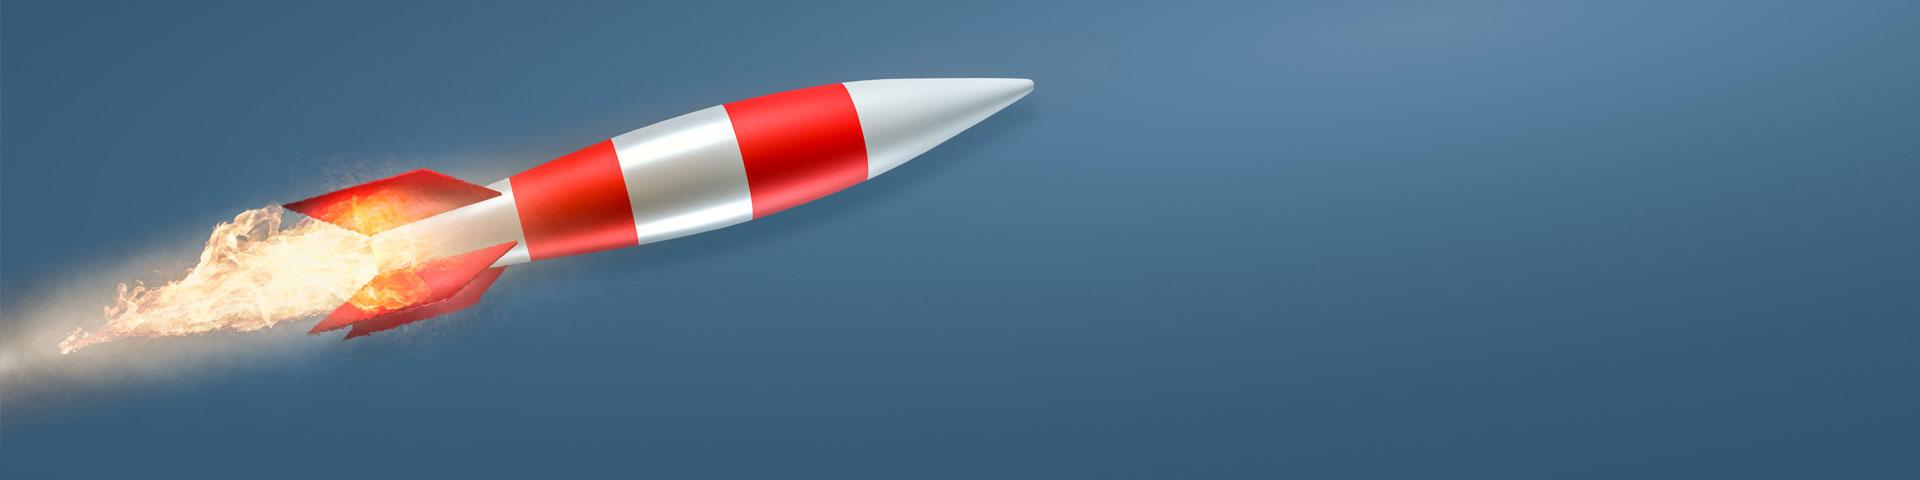 Rød/grå raket